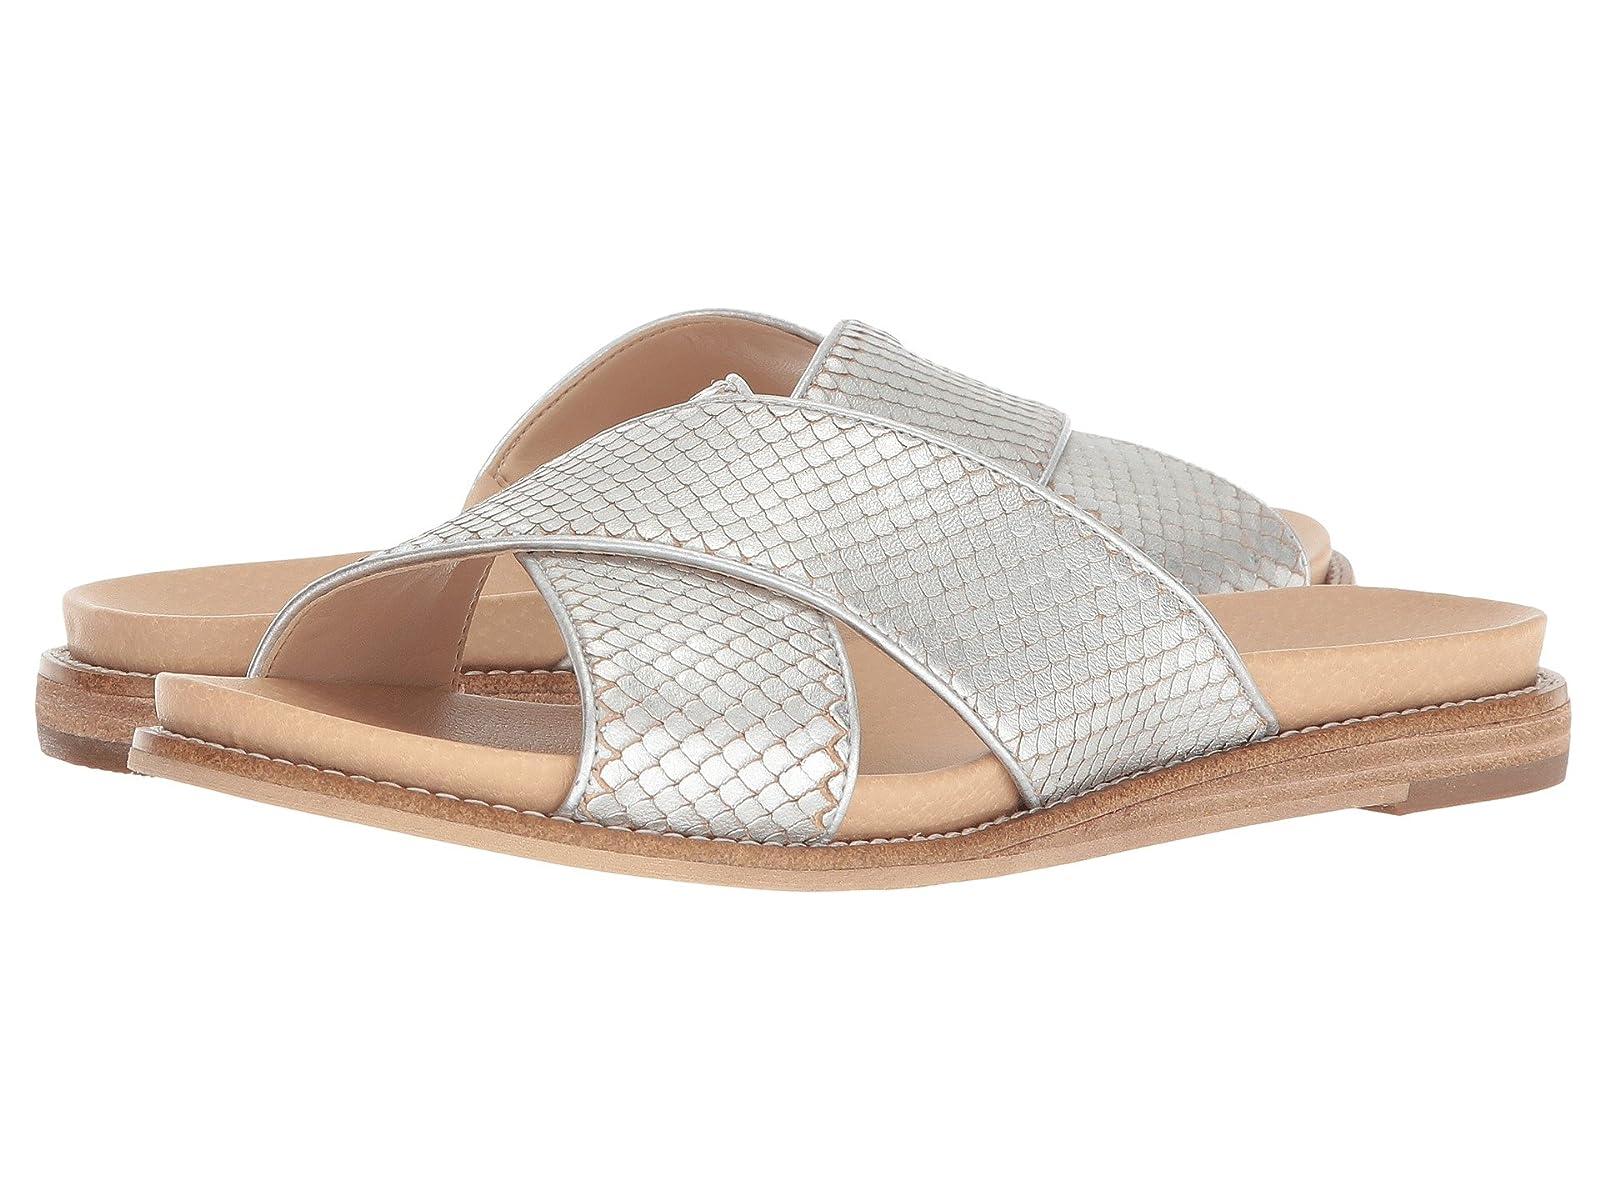 Dr. Scholl's Deco - Original CollectionComfortable and distinctive shoes